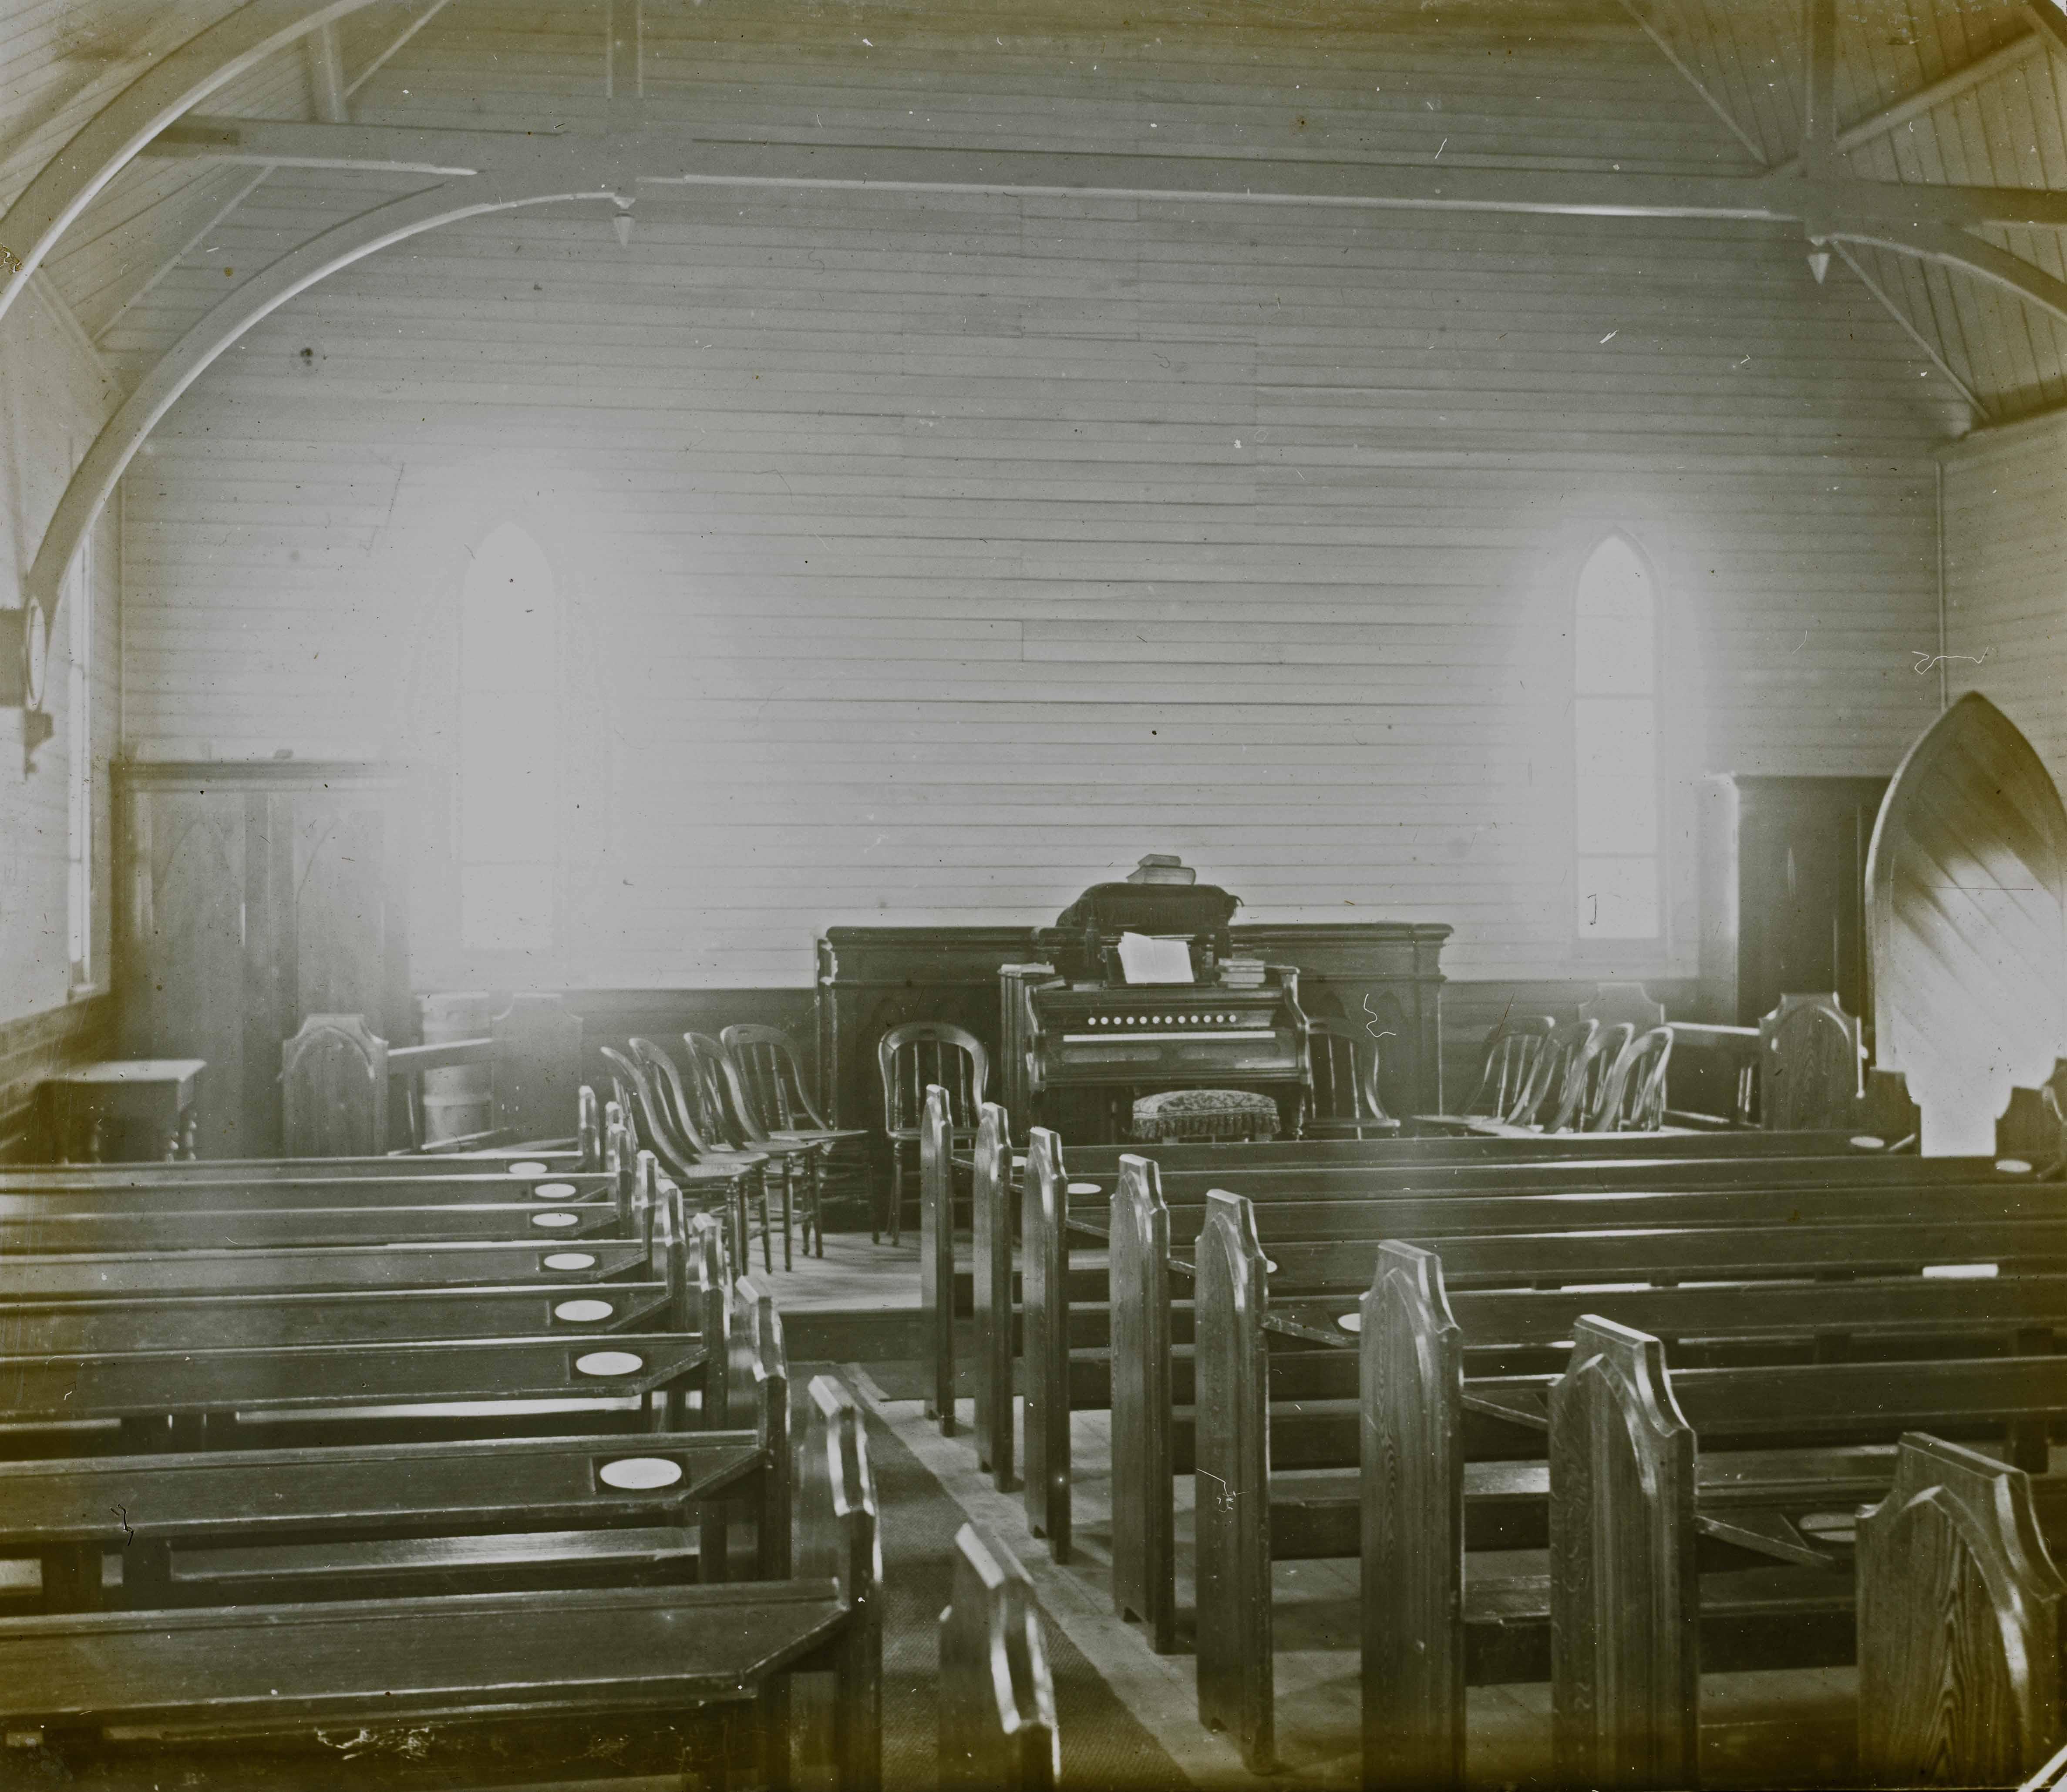 interior methodist primitive church west end slq